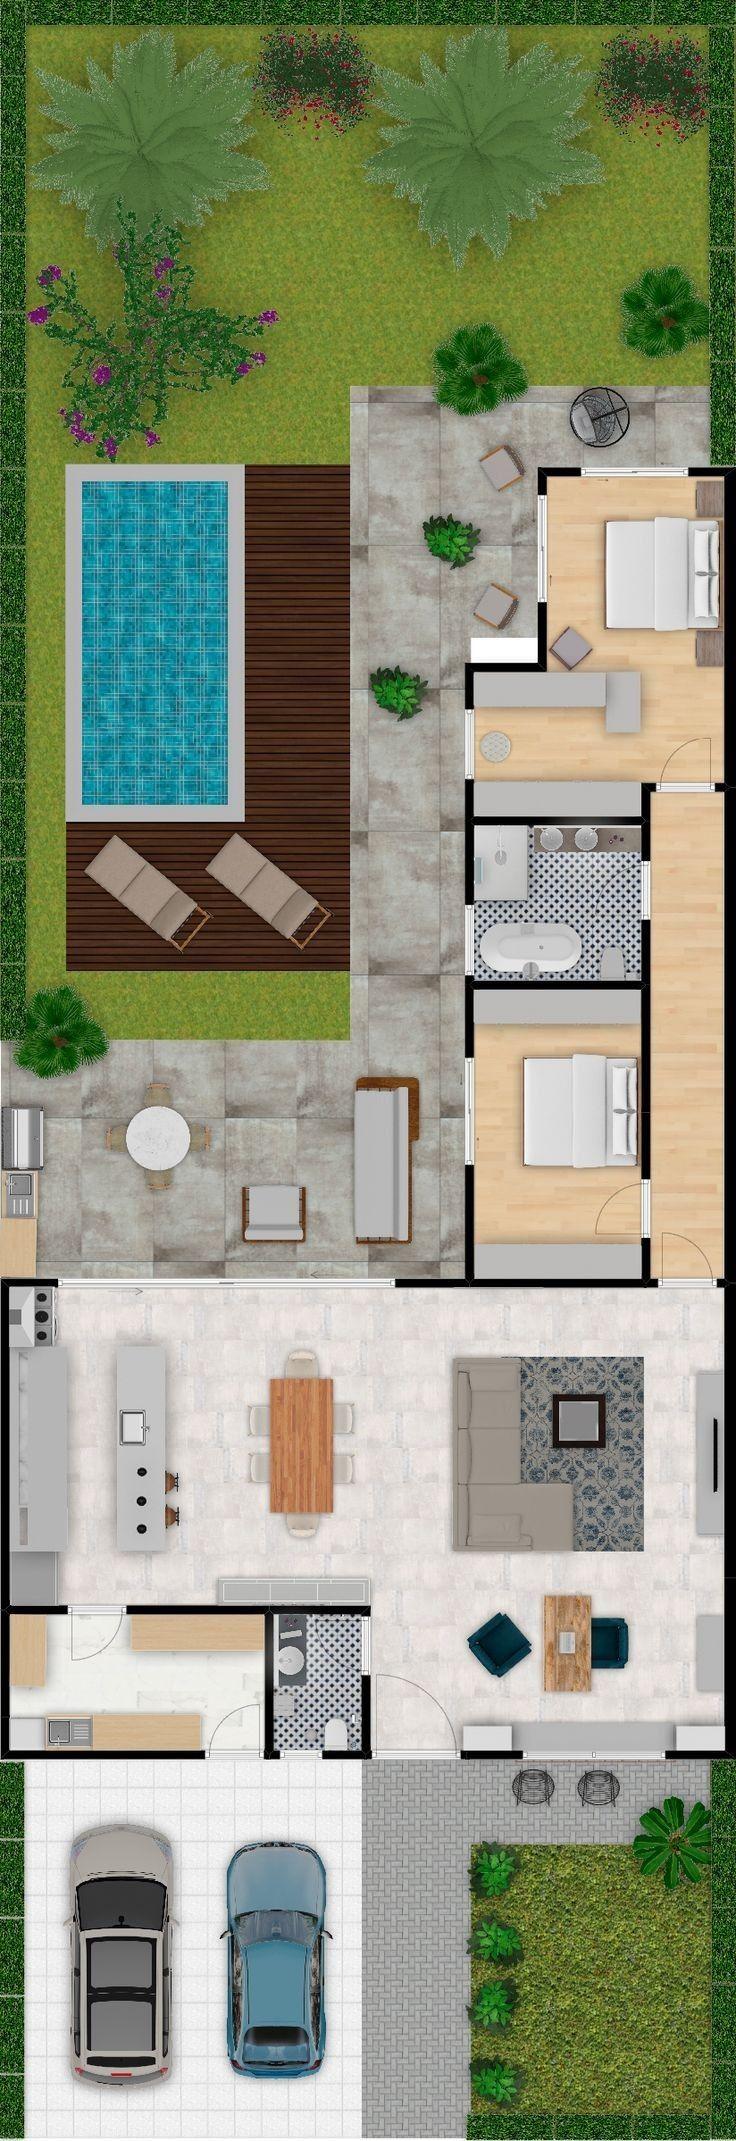 Top 40 3d Floor Plan Ideas House Construction Plan Beach House Floor Plans House Layout Plans